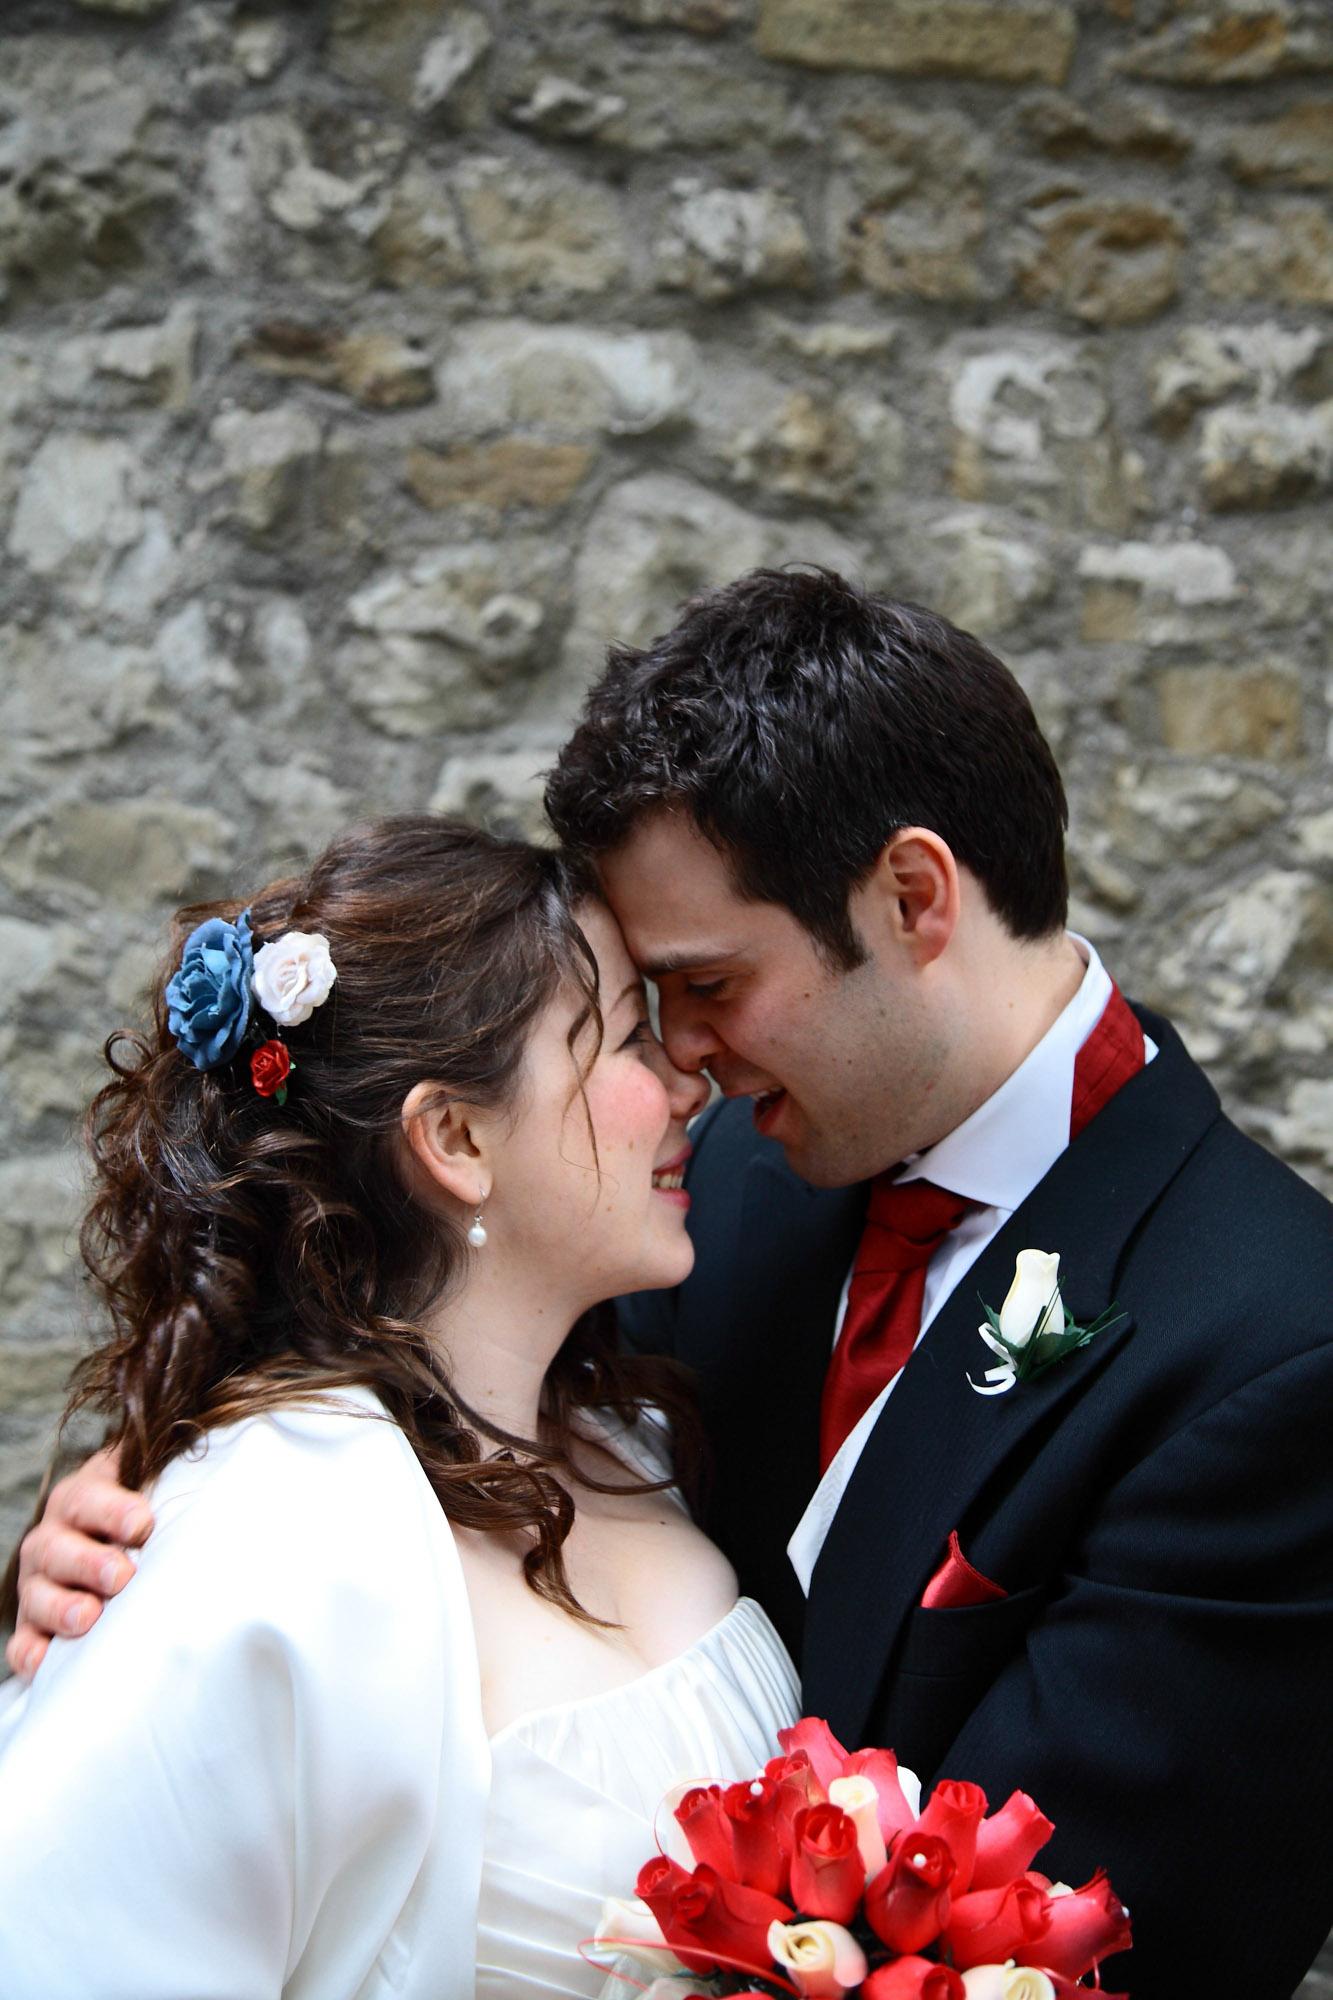 weddings-couples-love-photographer-oxford-london-jonathan-self-photography-82.jpg